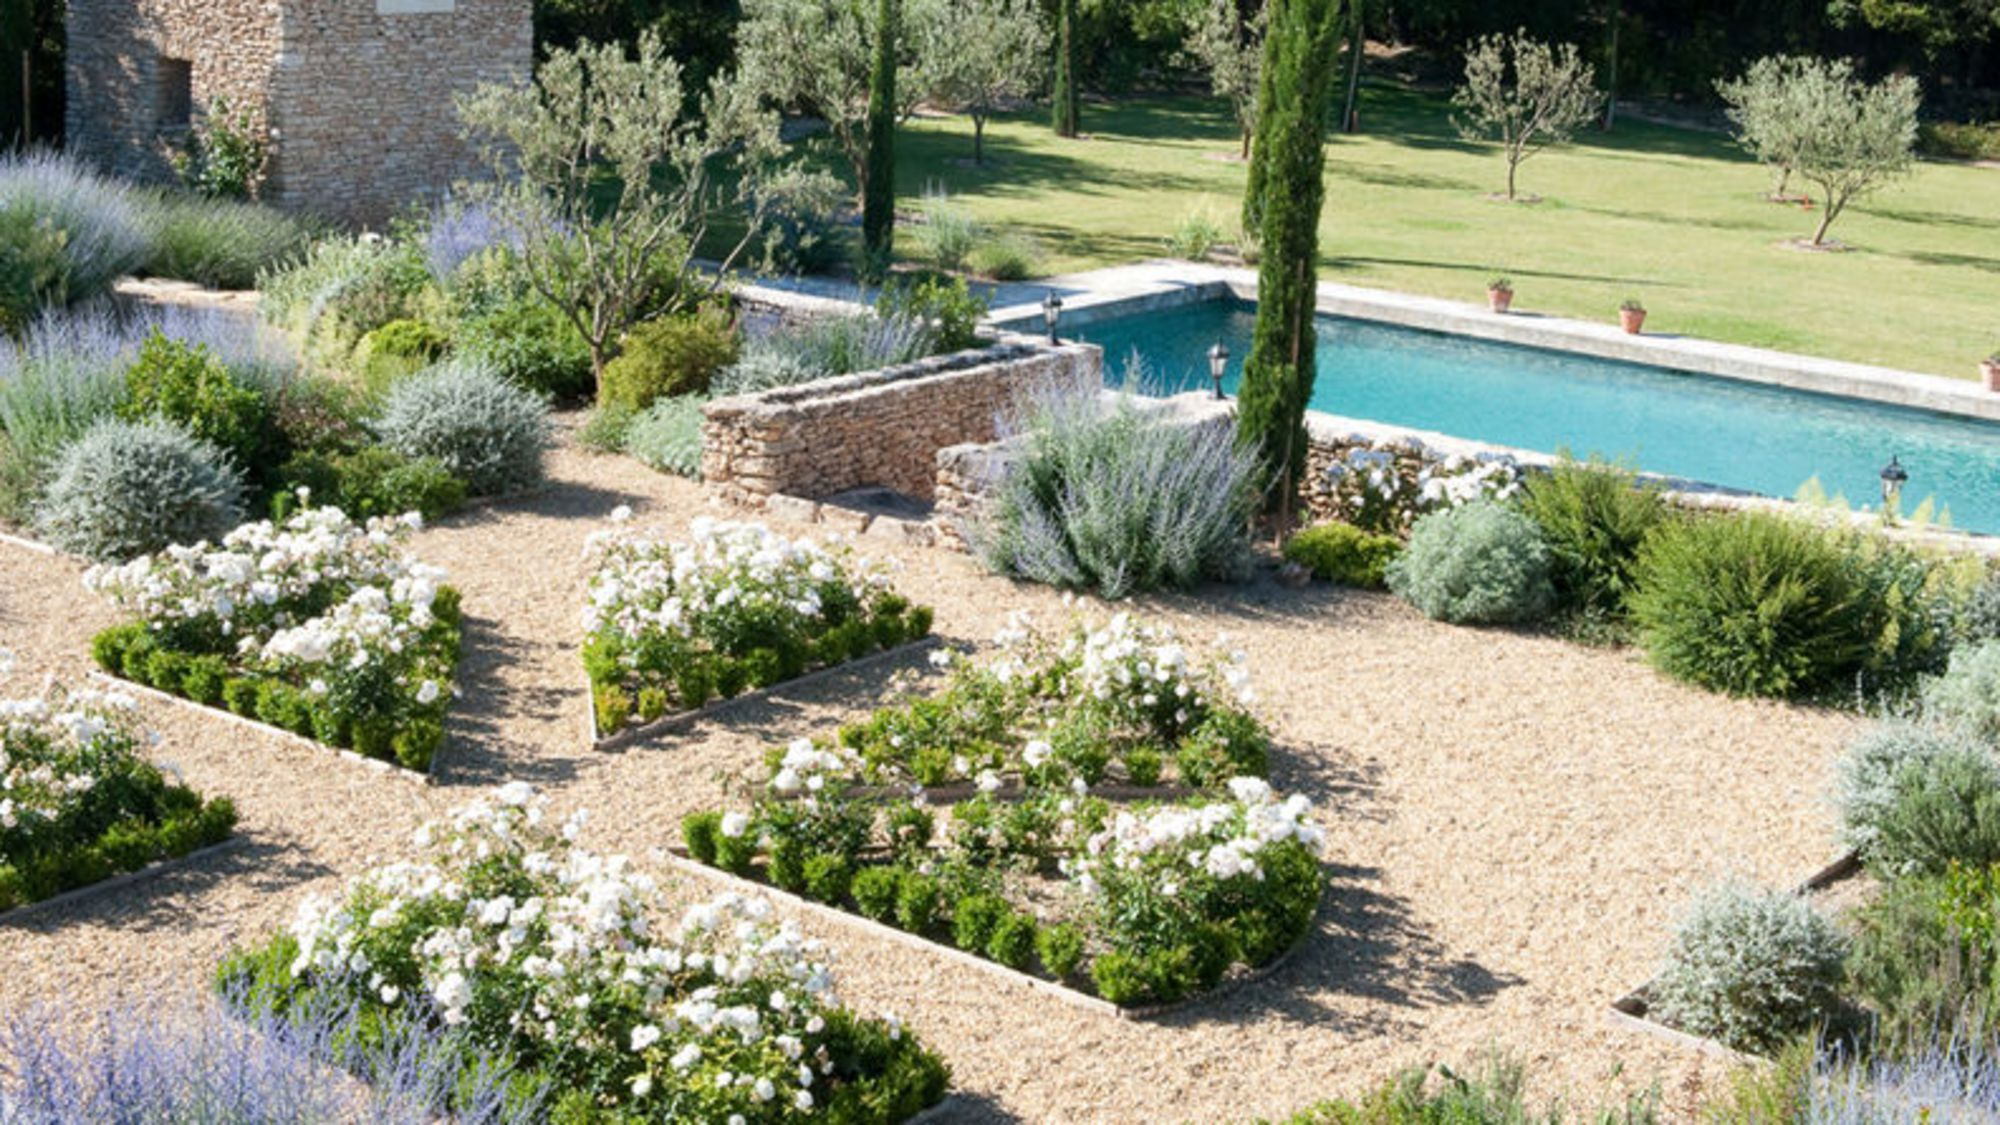 Comment am nager un jardin m diterran en c t maison - Creer un jardin mediterraneen ...